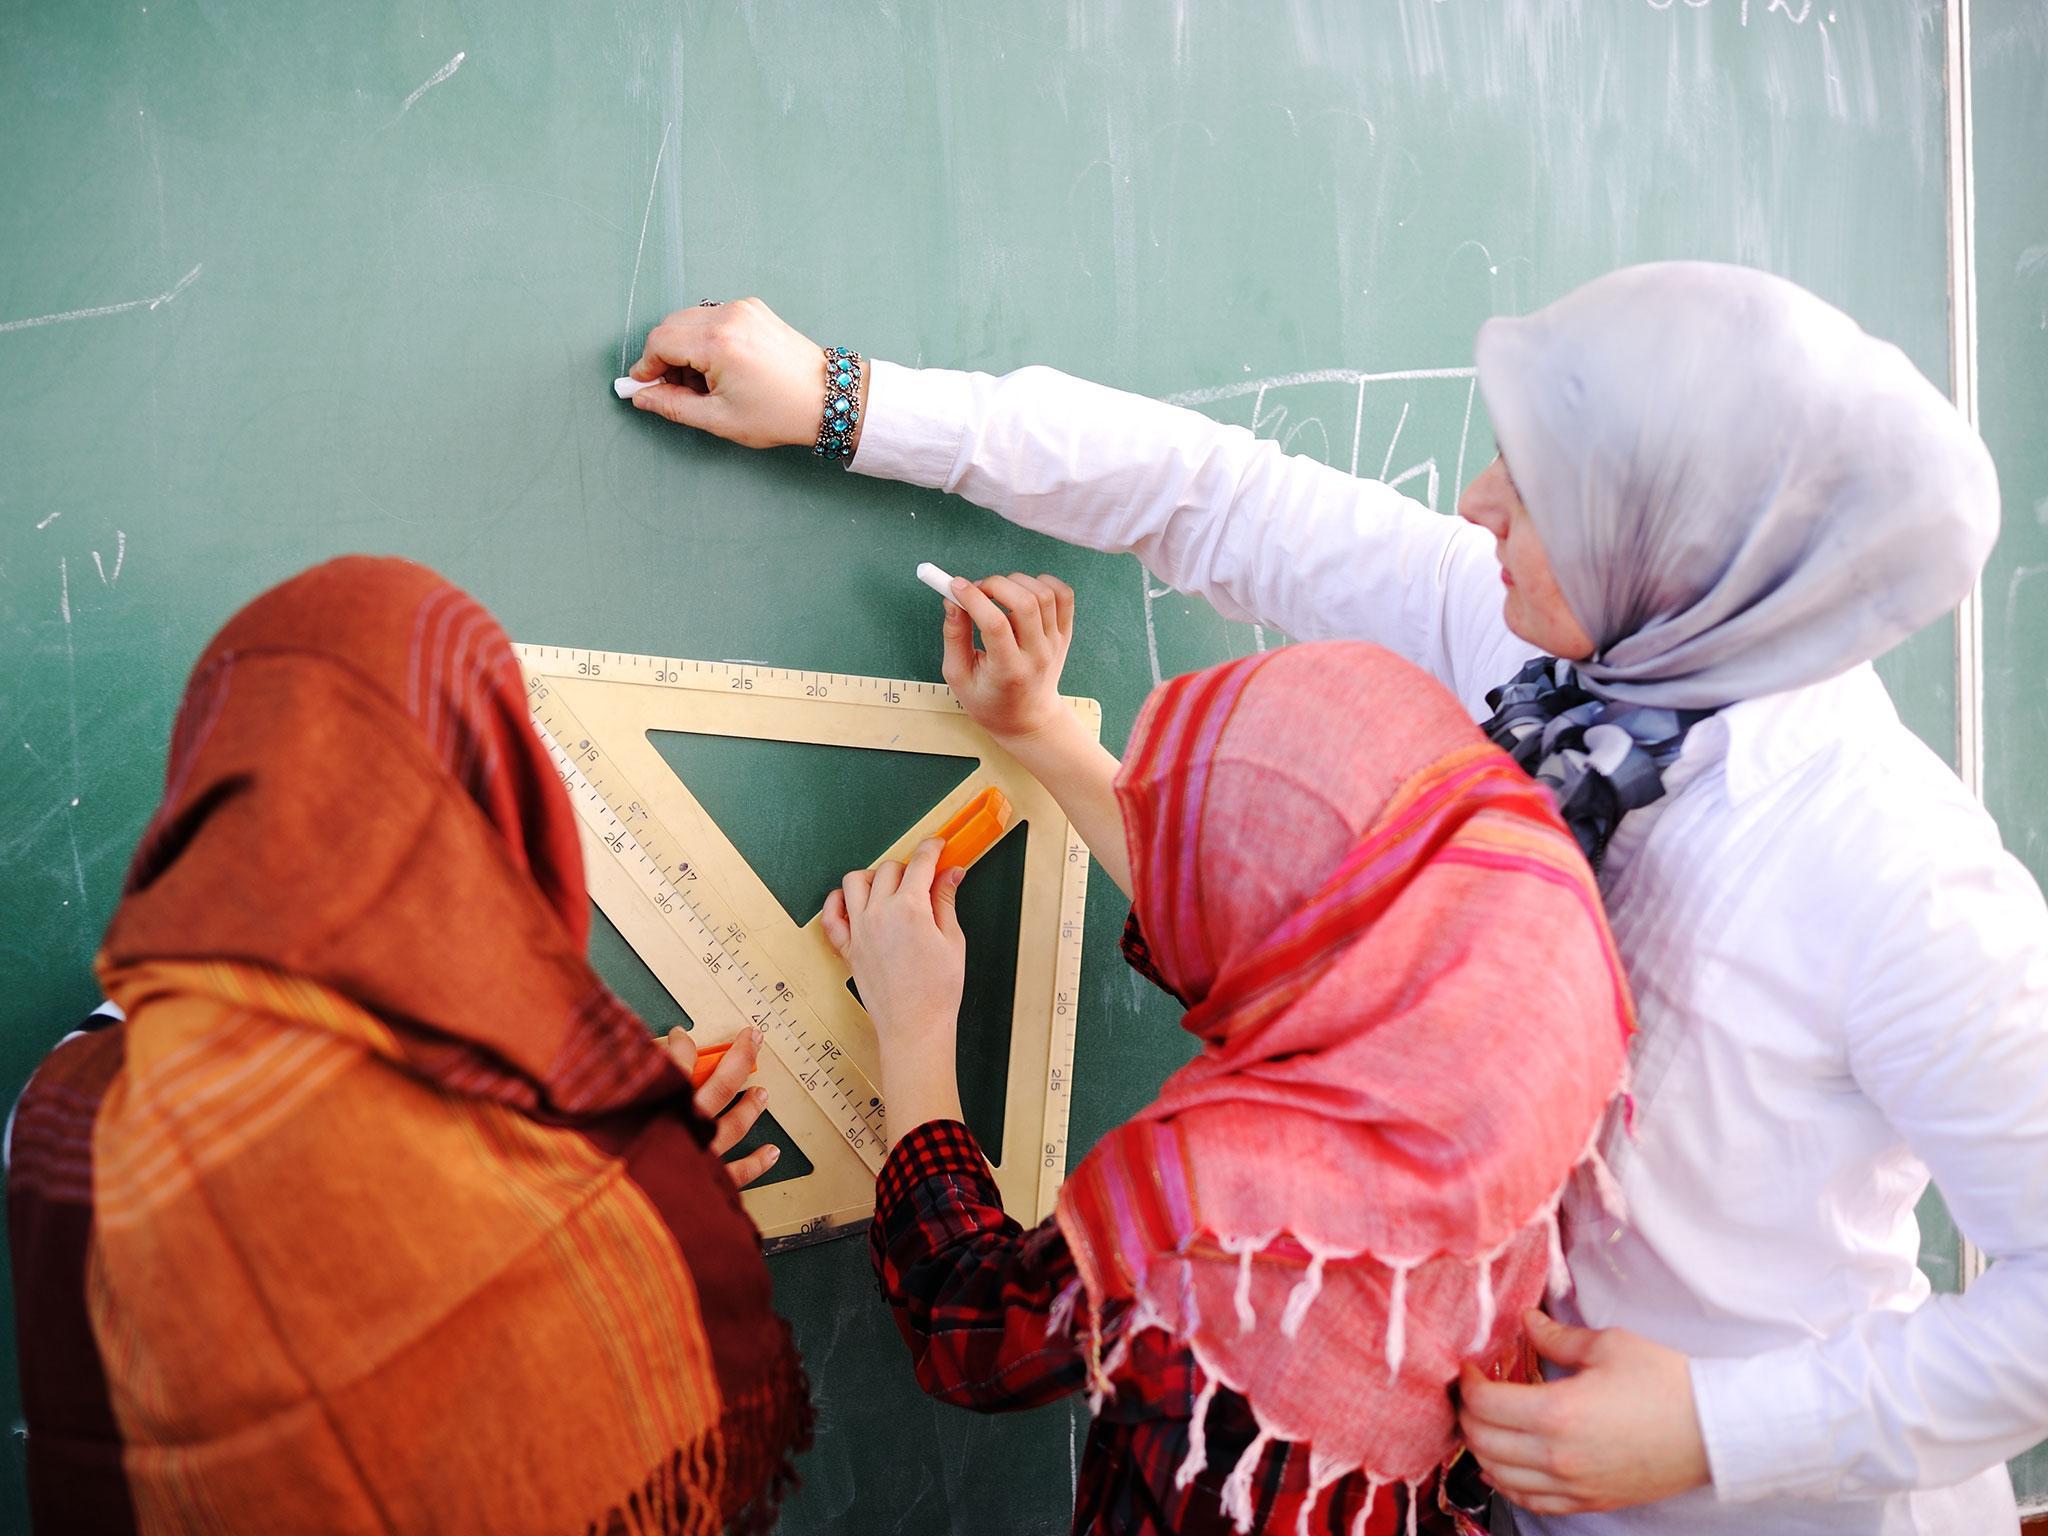 School inspectors to quiz Muslim girls who wear the hijab